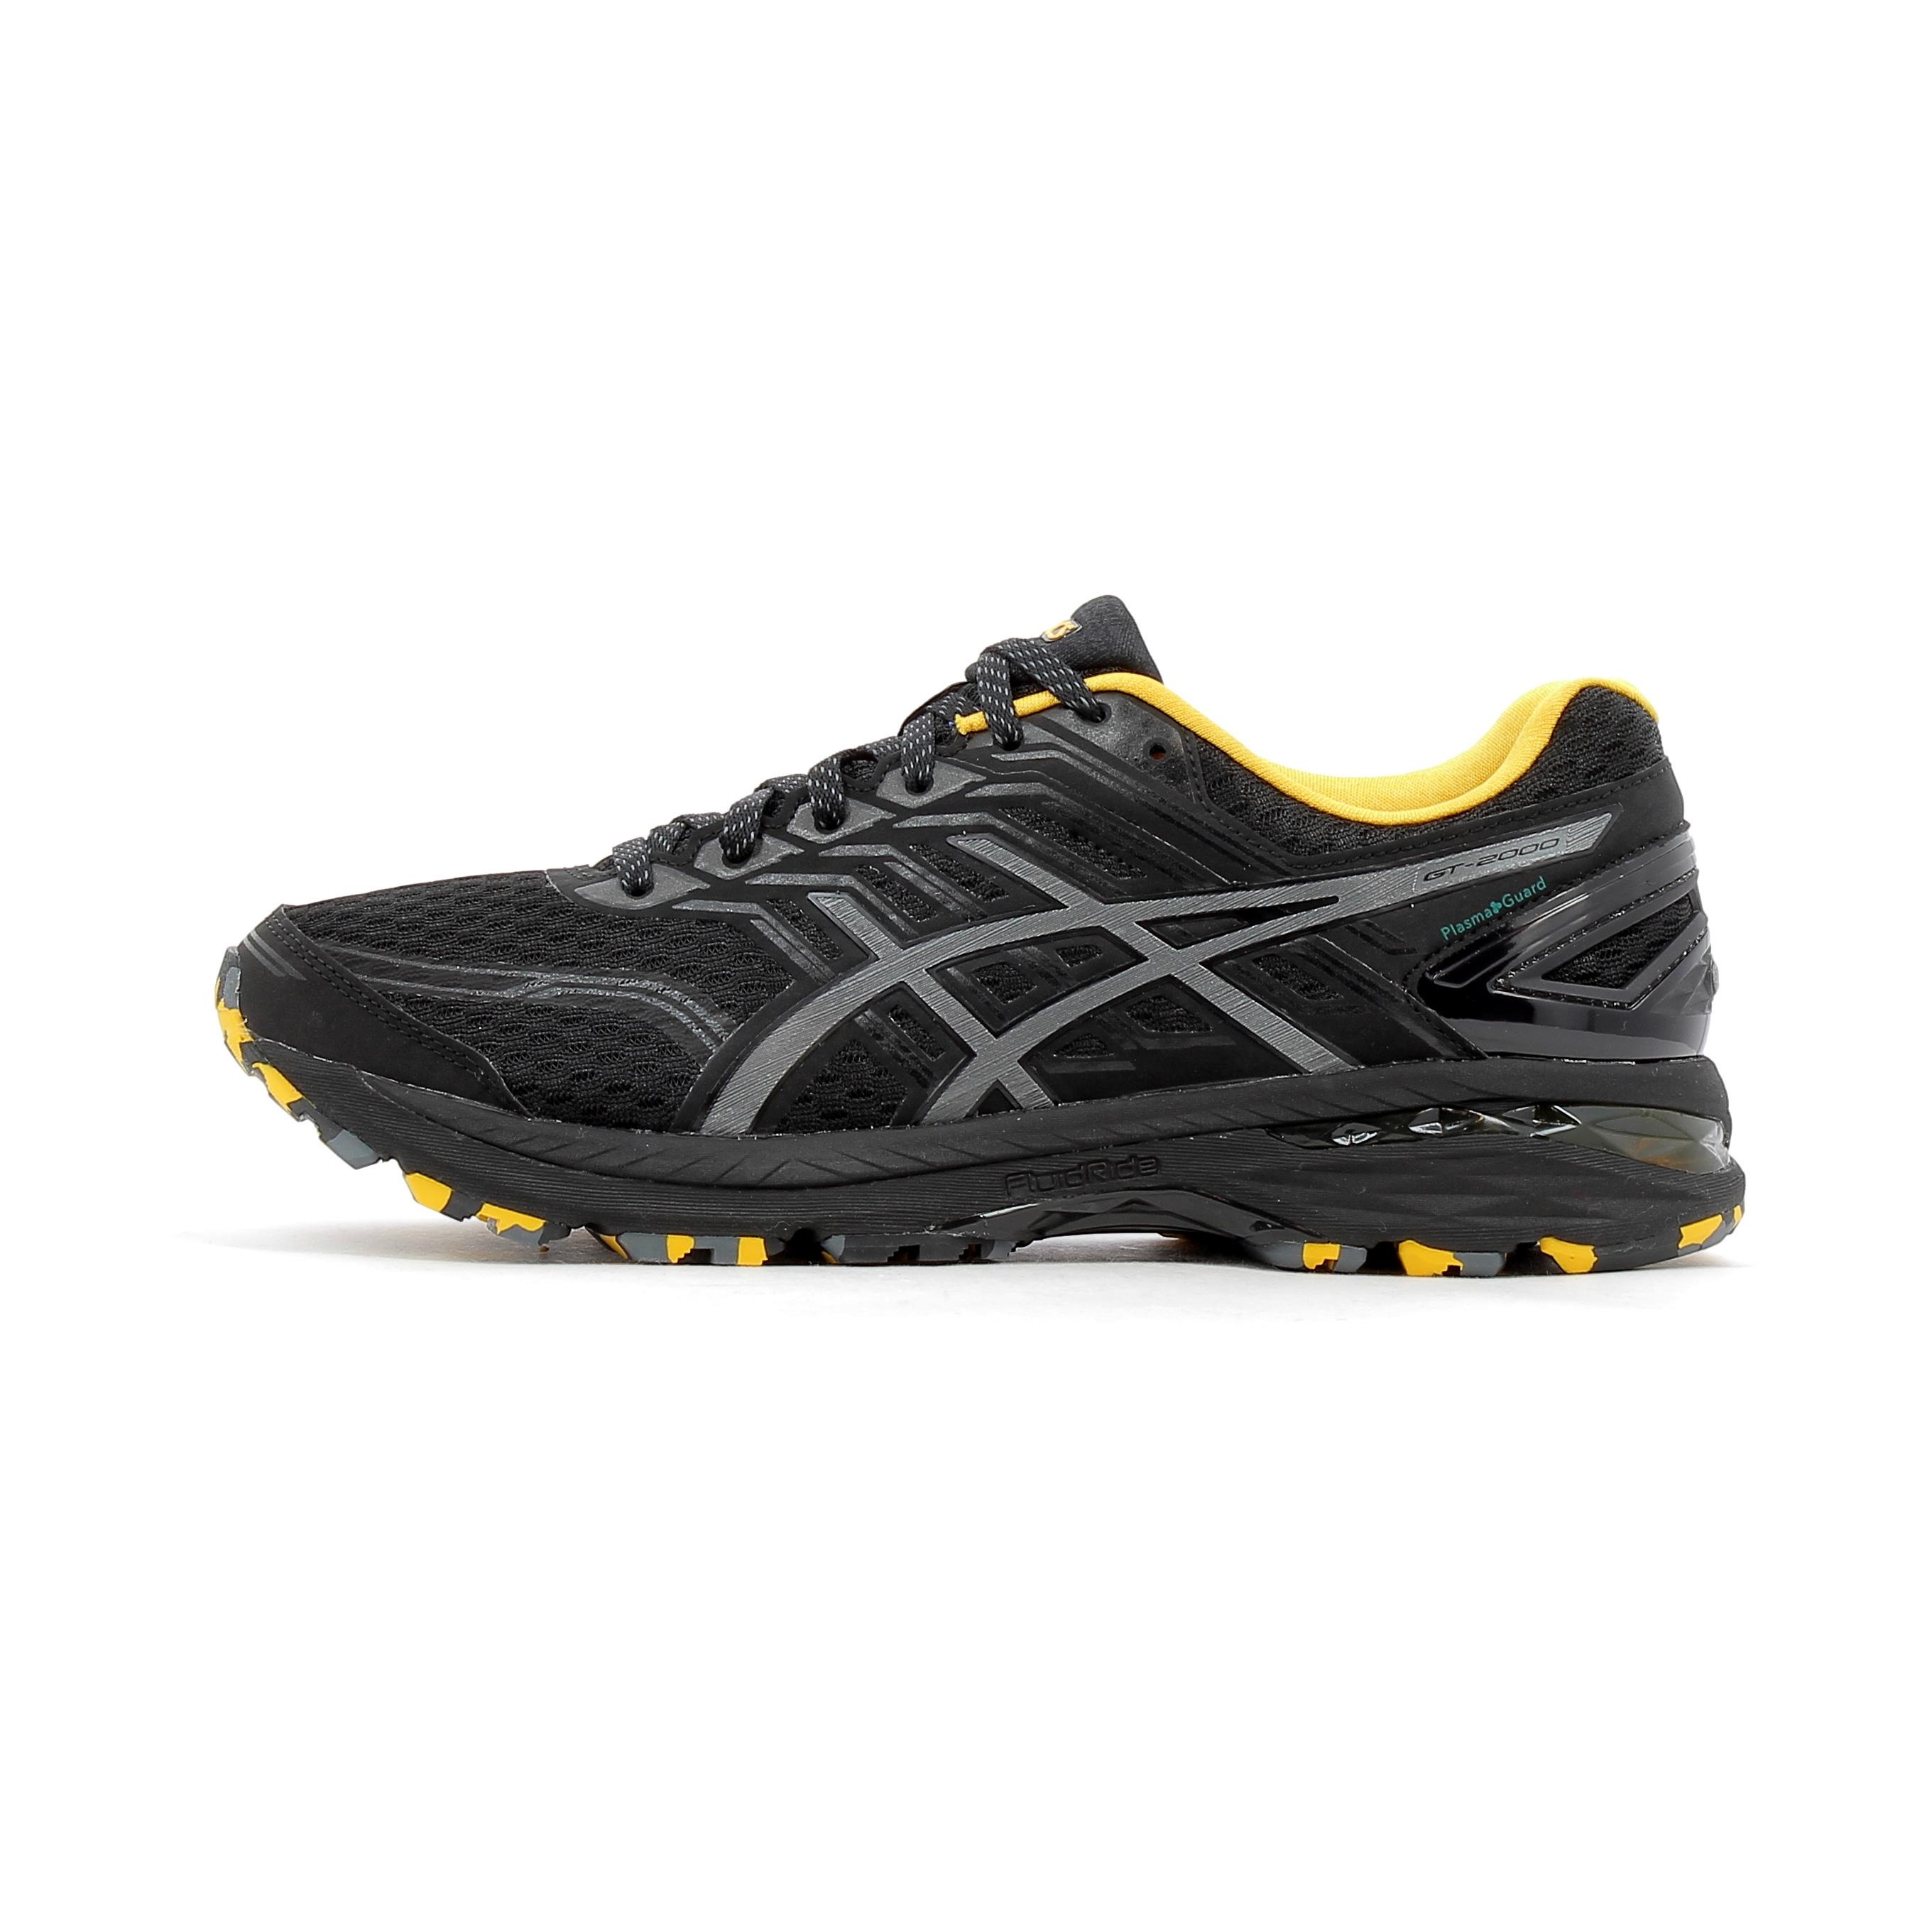 Chaussures Noir 2000 Running Trail Plasmaguard Asics Gt De 5 OPw0k8n